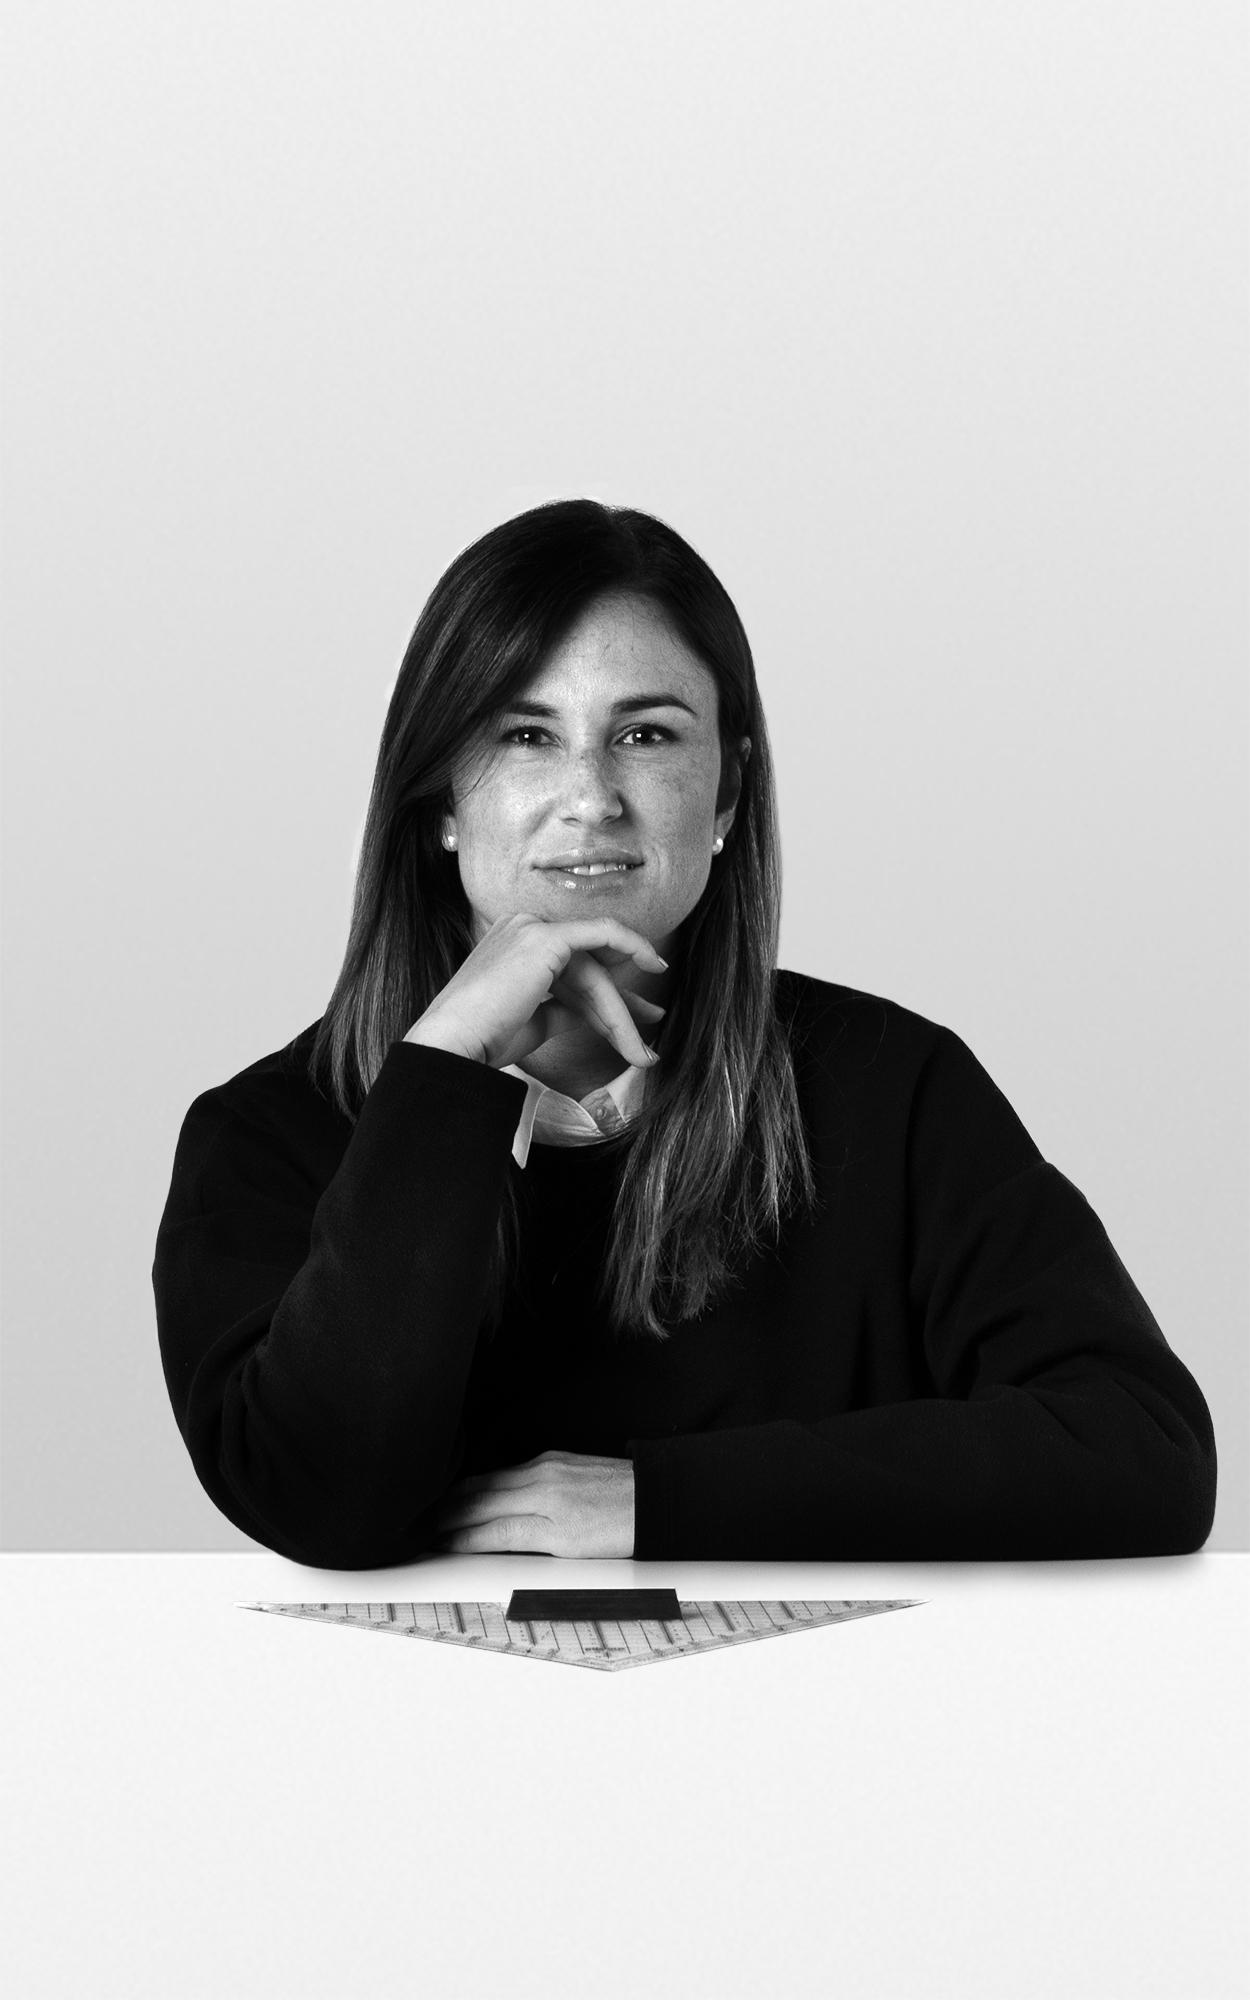 Adriana Hernandez